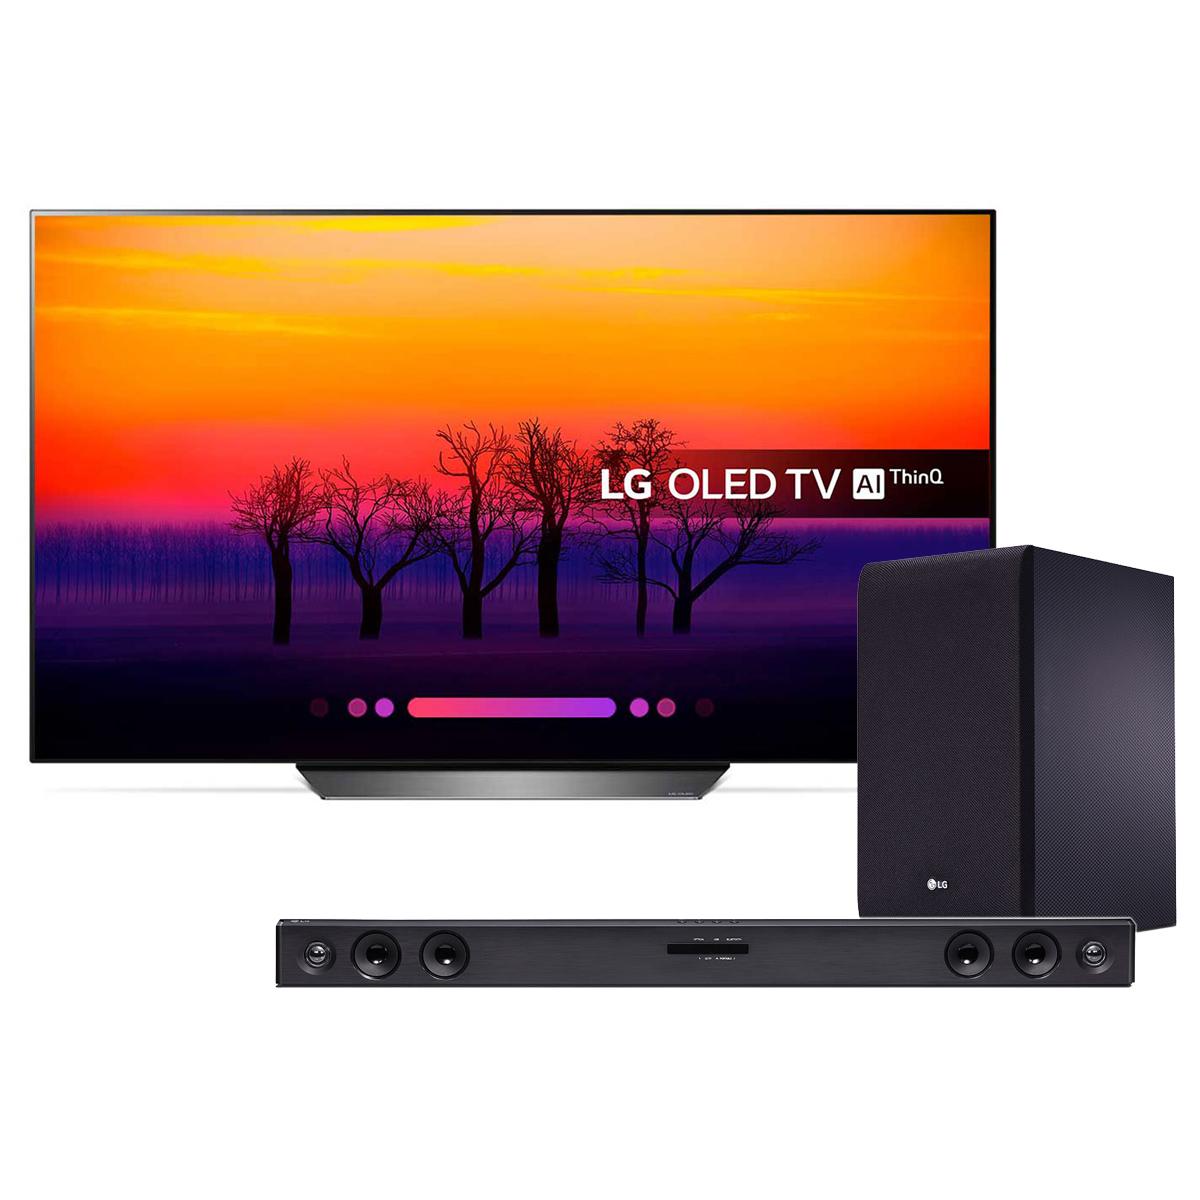 "TV LG OLED55B8 + SJ3 Téléviseur OLED 4K 55"" (140 cm) 16/9 - 3840 x 2160 pixels - Ultra HD 2160p - HDR - Wi-Fi - Bluetooth - Dolby Atmos + Barre de son 2.1 300 Watts"